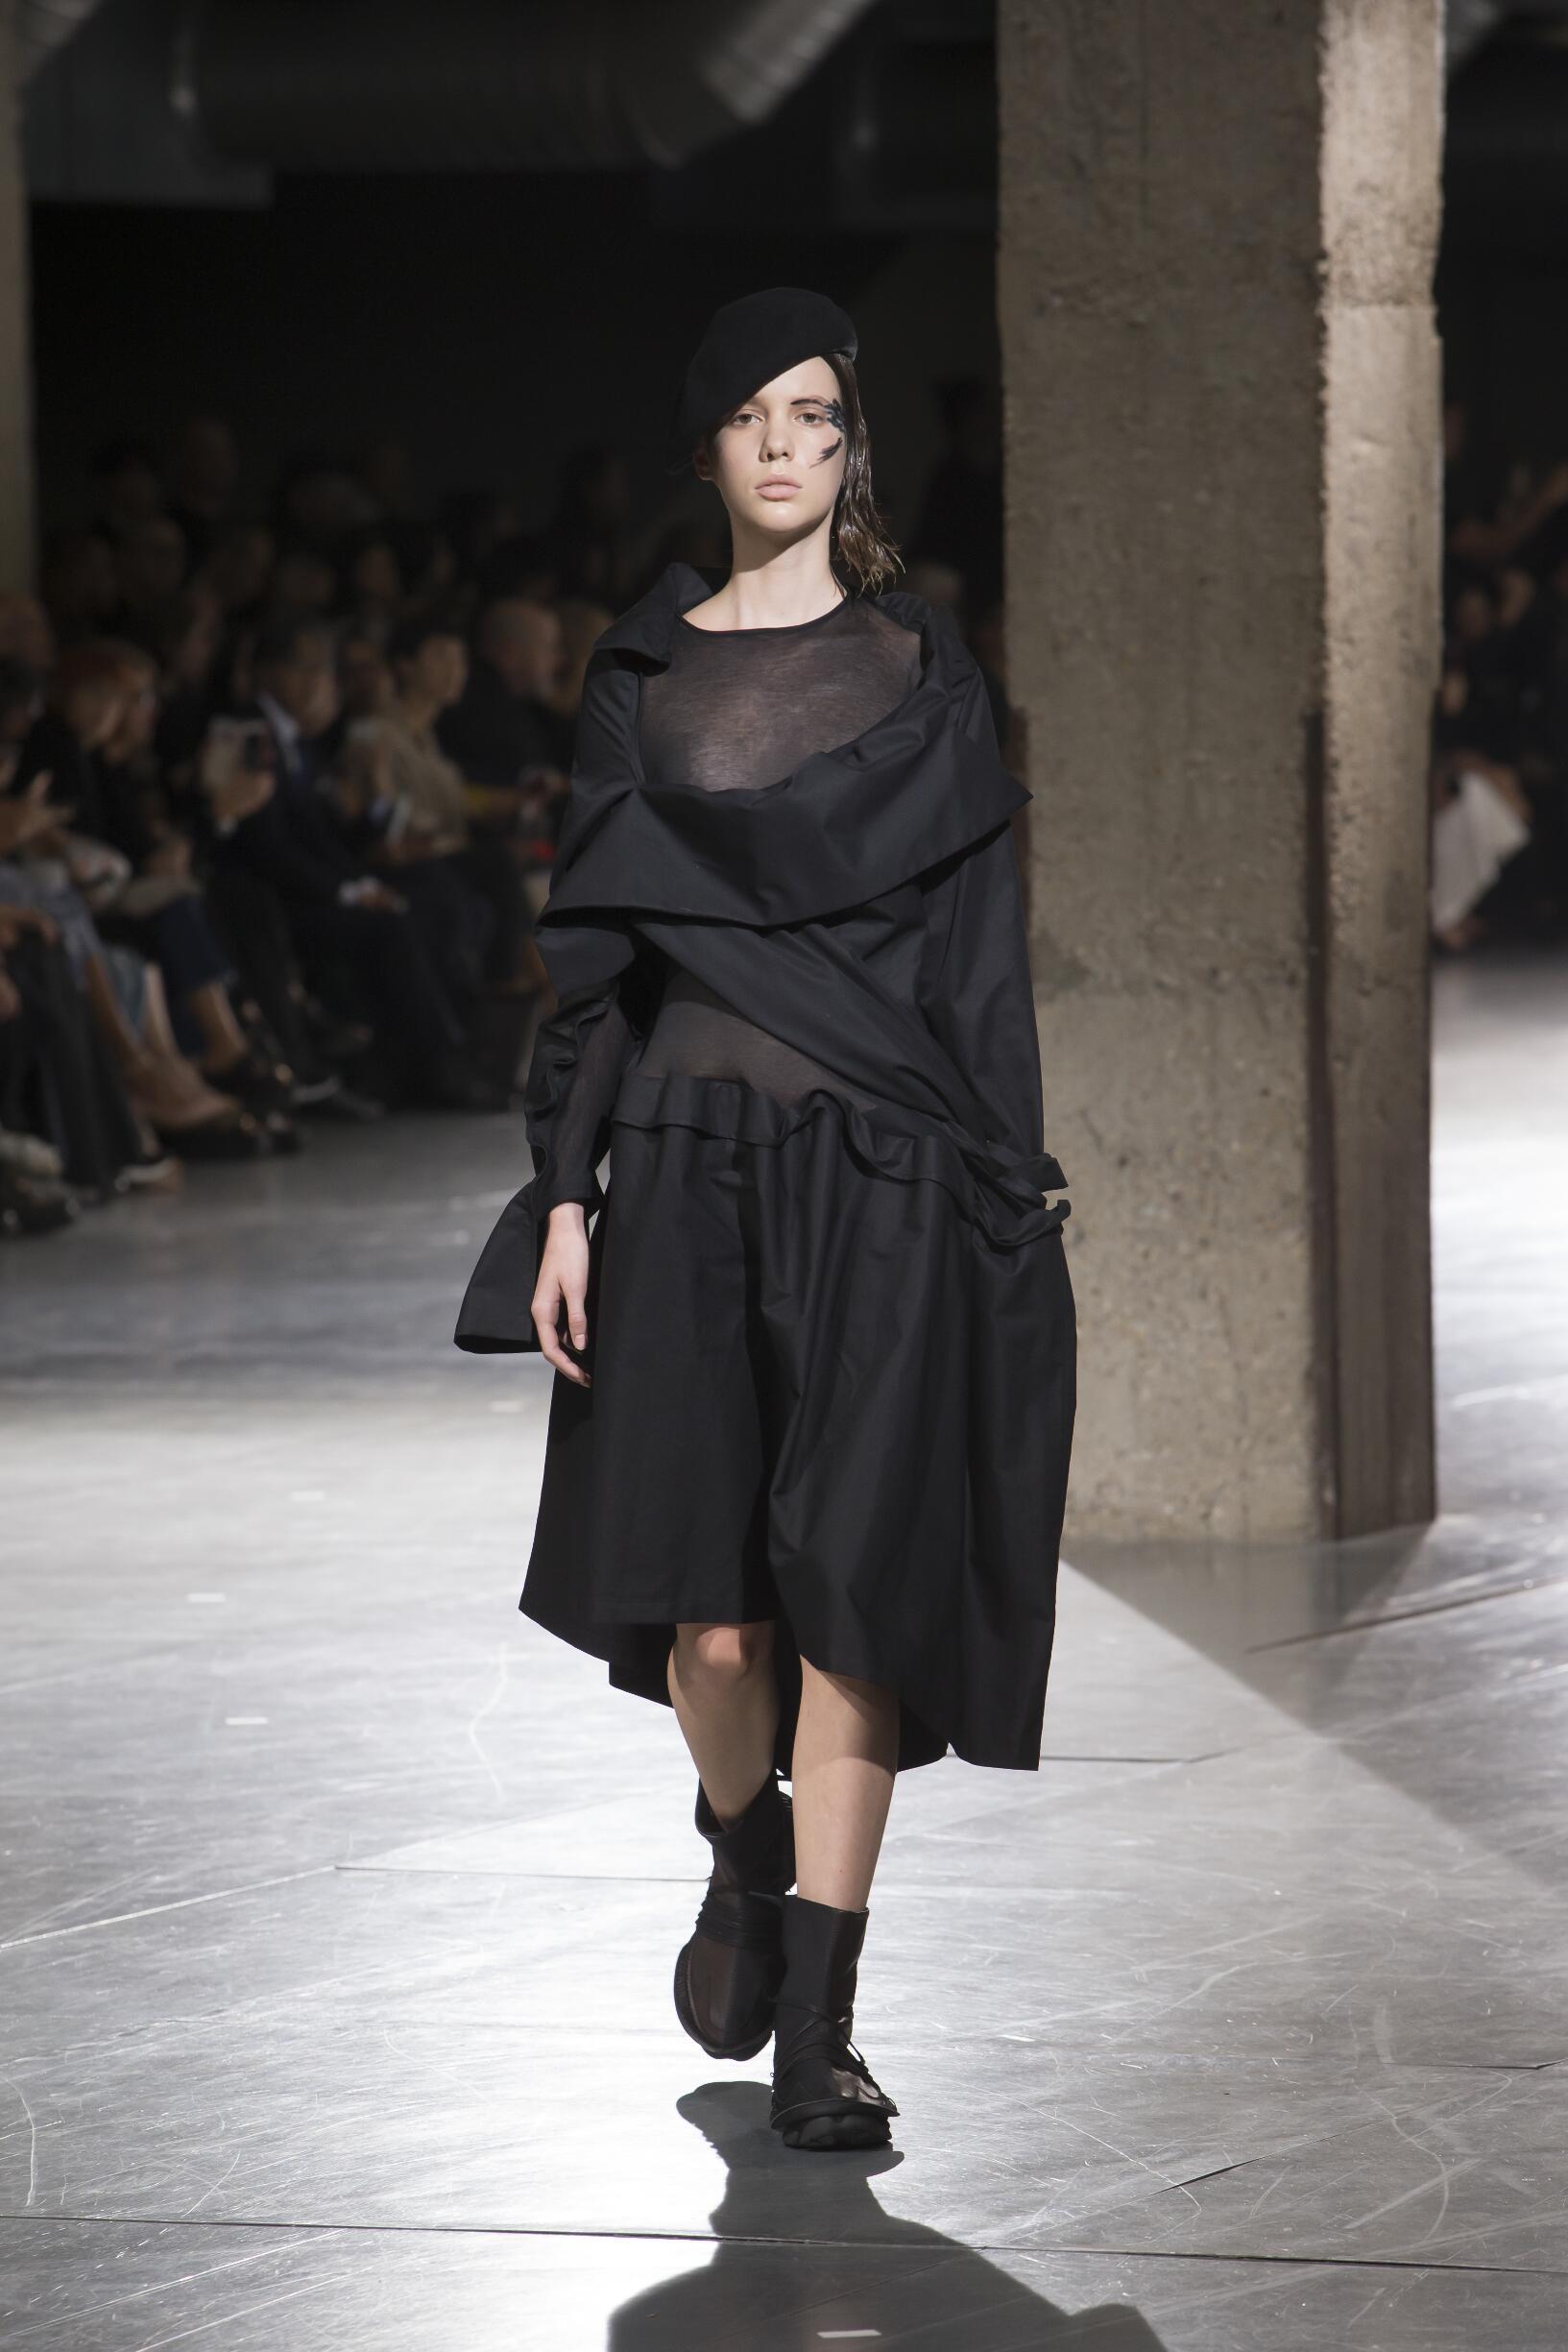 Yohji Yamamoto SS 2018 Womenswear